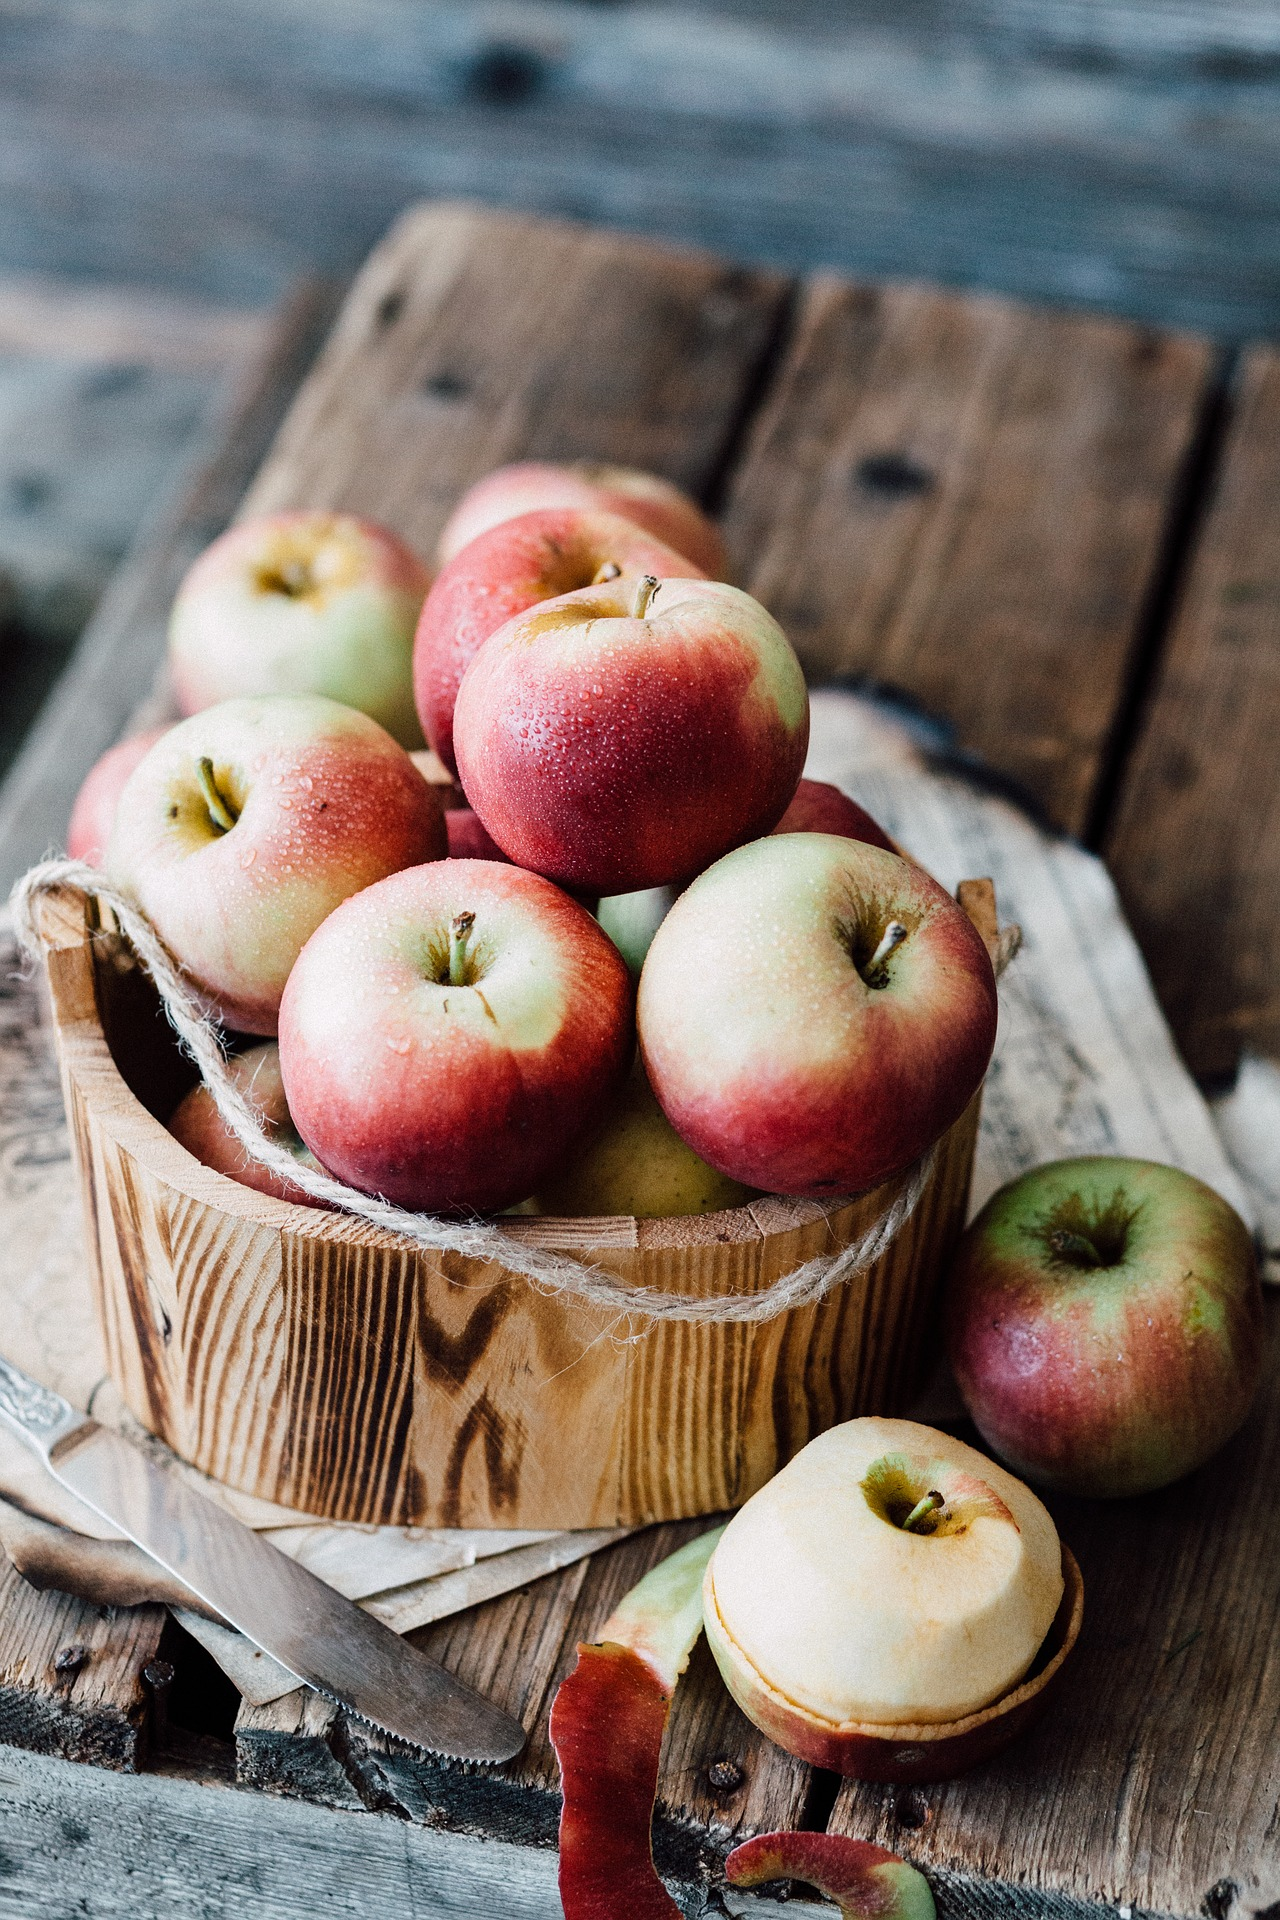 apples-2044037_1920.jpg